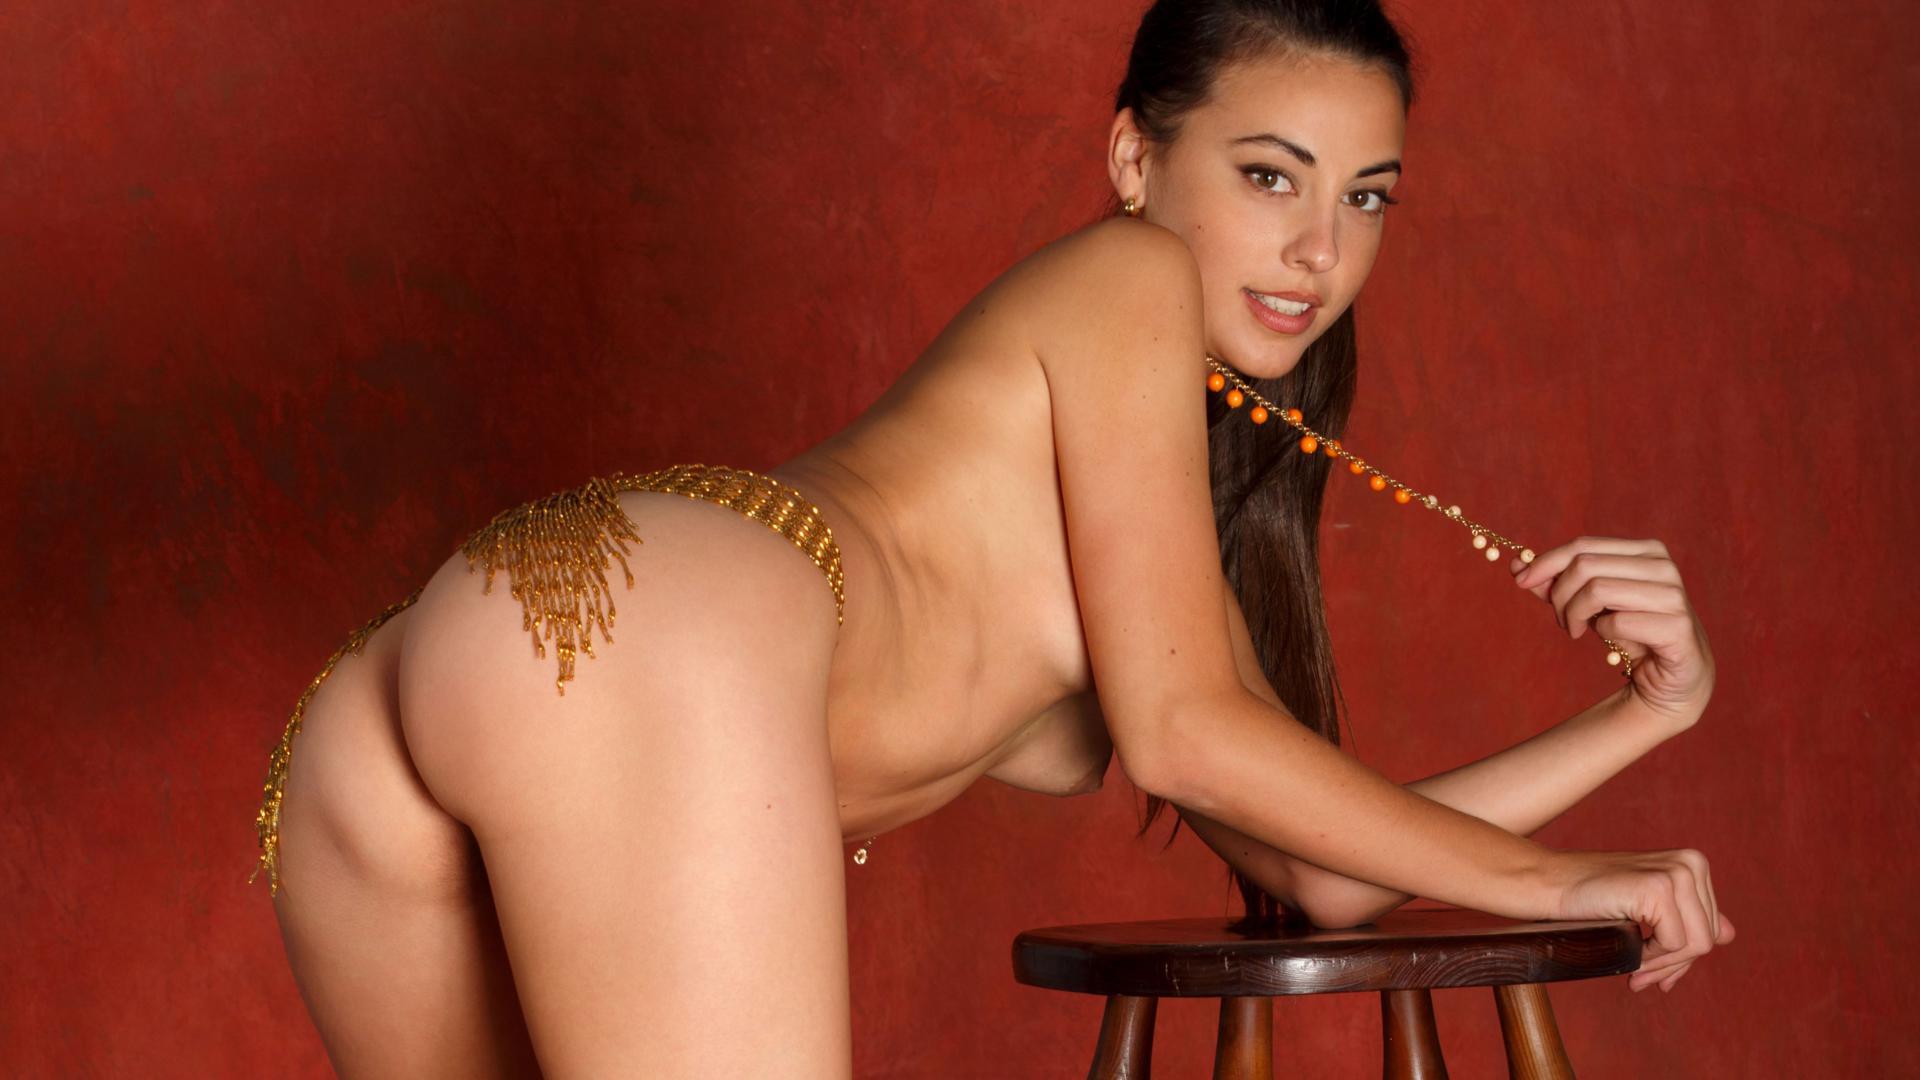 Nude pics of eva